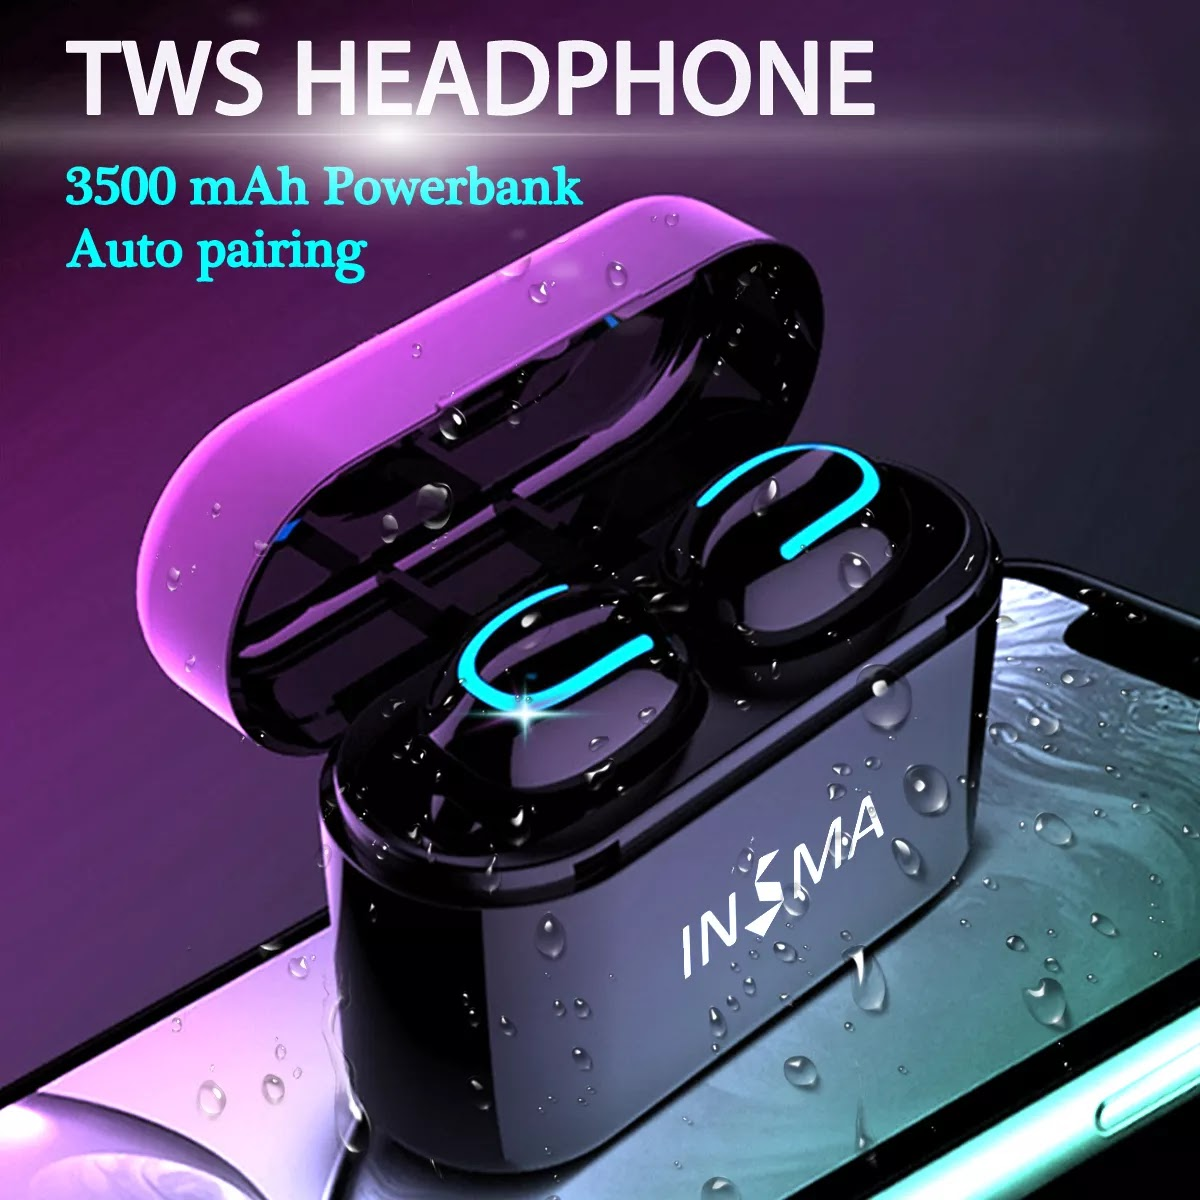 88cb69678 INSMA VFM-1 TWS Bluetooth 5.0 Earphone 3500mAh Power Bank CVC6.0 Noise  Cancelling